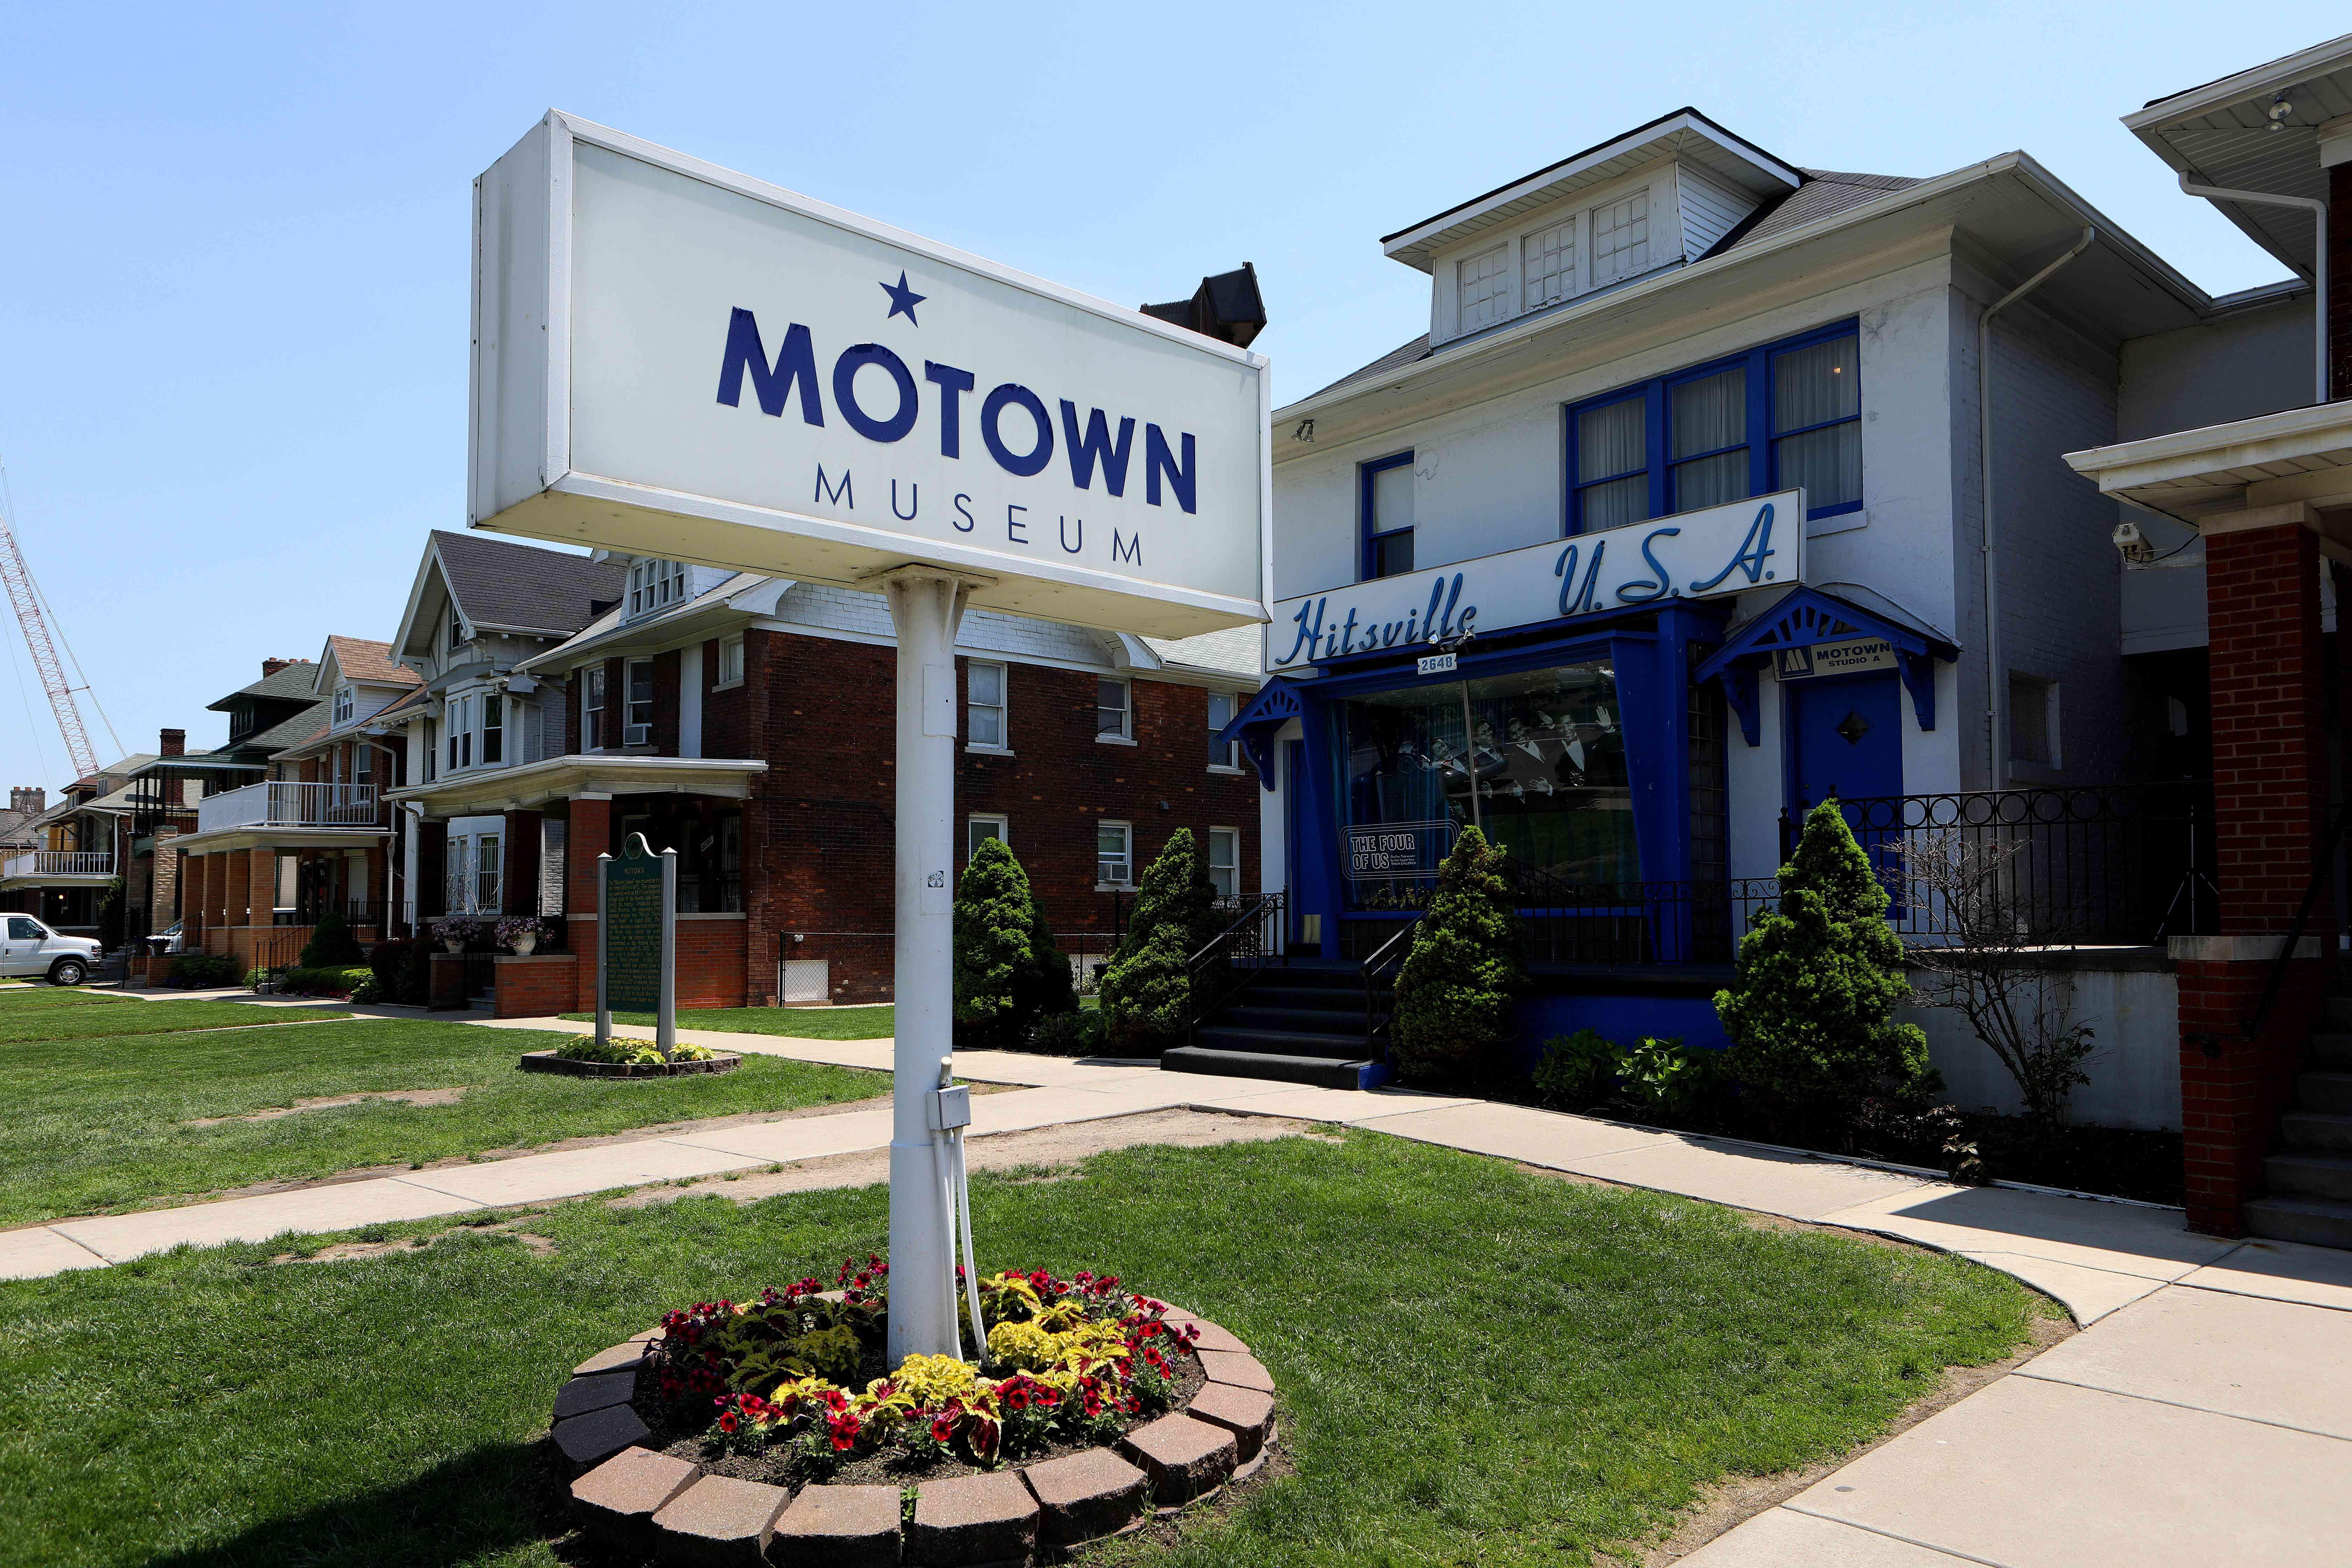 Motown Museum (Hitsville U.S.A.), original home of Motown Records in Detroit, Michigan